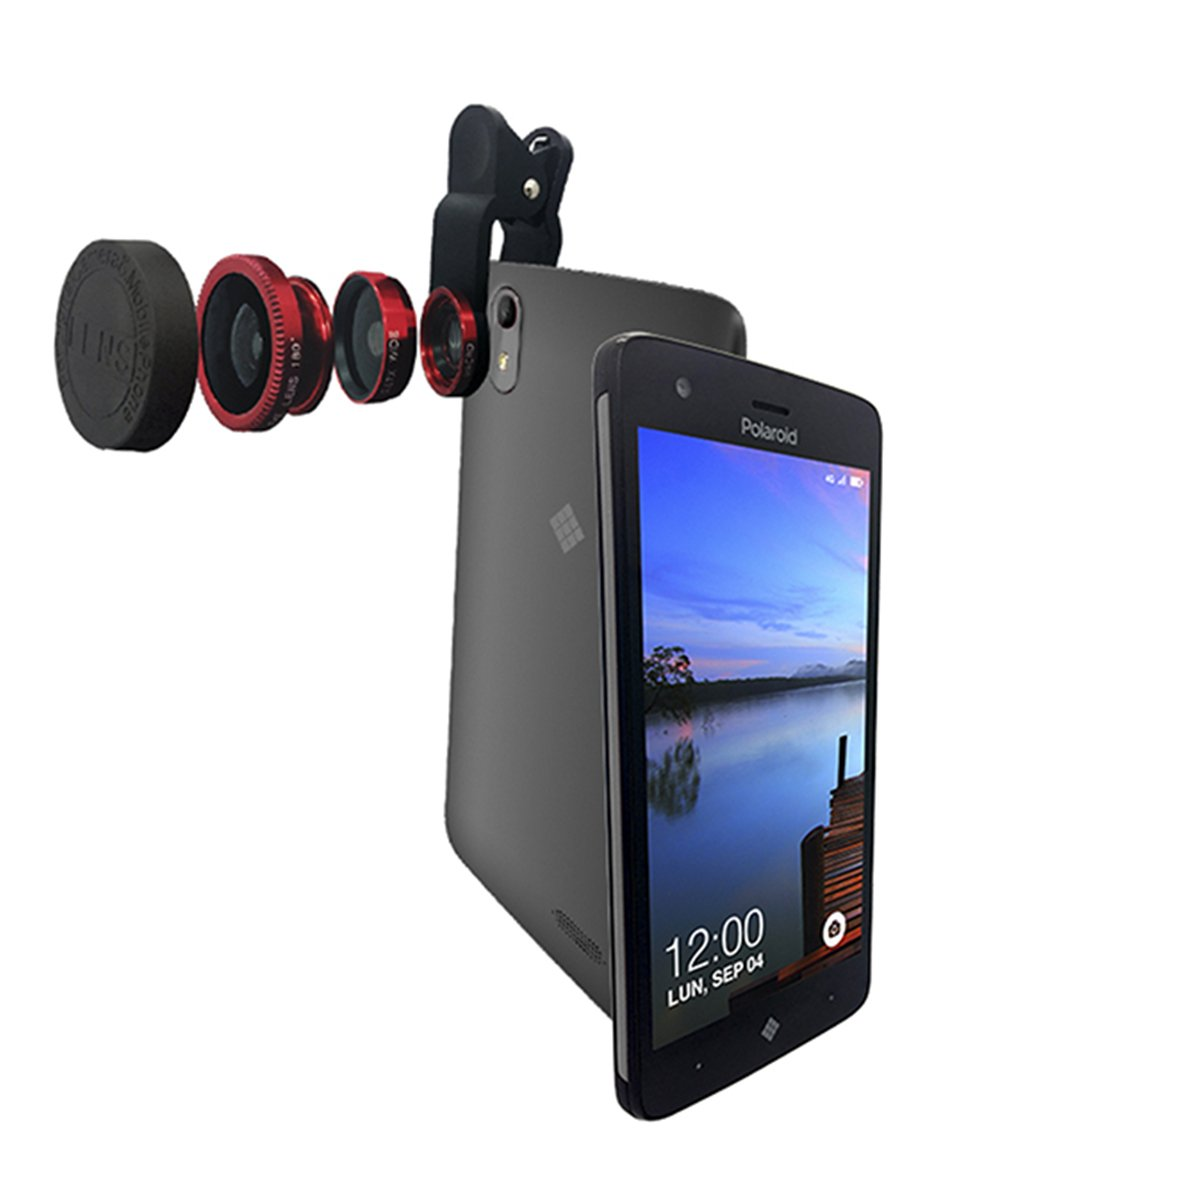 33ac4e8bd7 Celular Polaroid P5026 Cosmo Color Gris R9 (Telcel) | SEARS.COM.MX ...